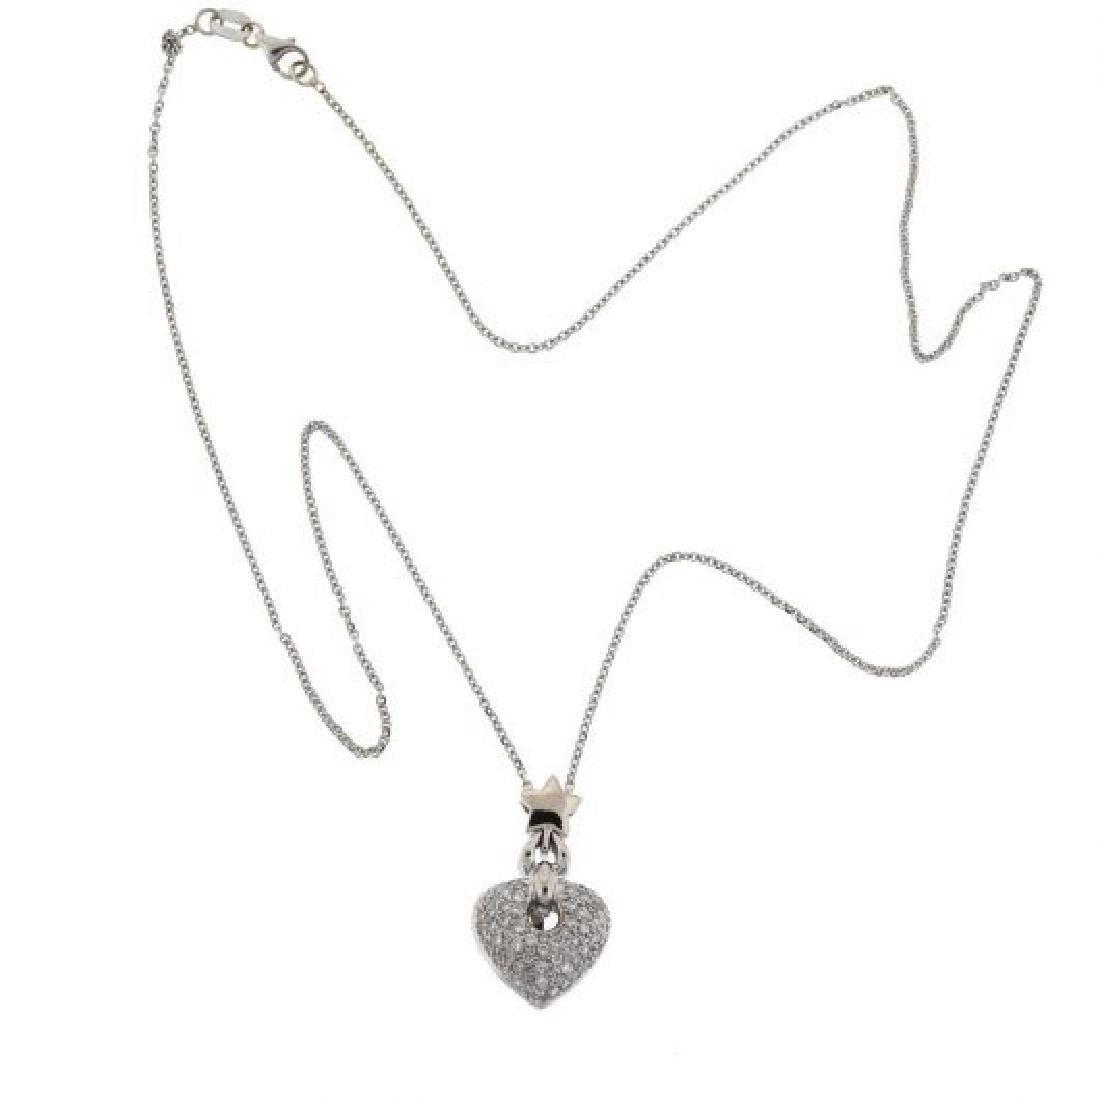 18k  Gold Diamond Heart Pendant Necklace - 3